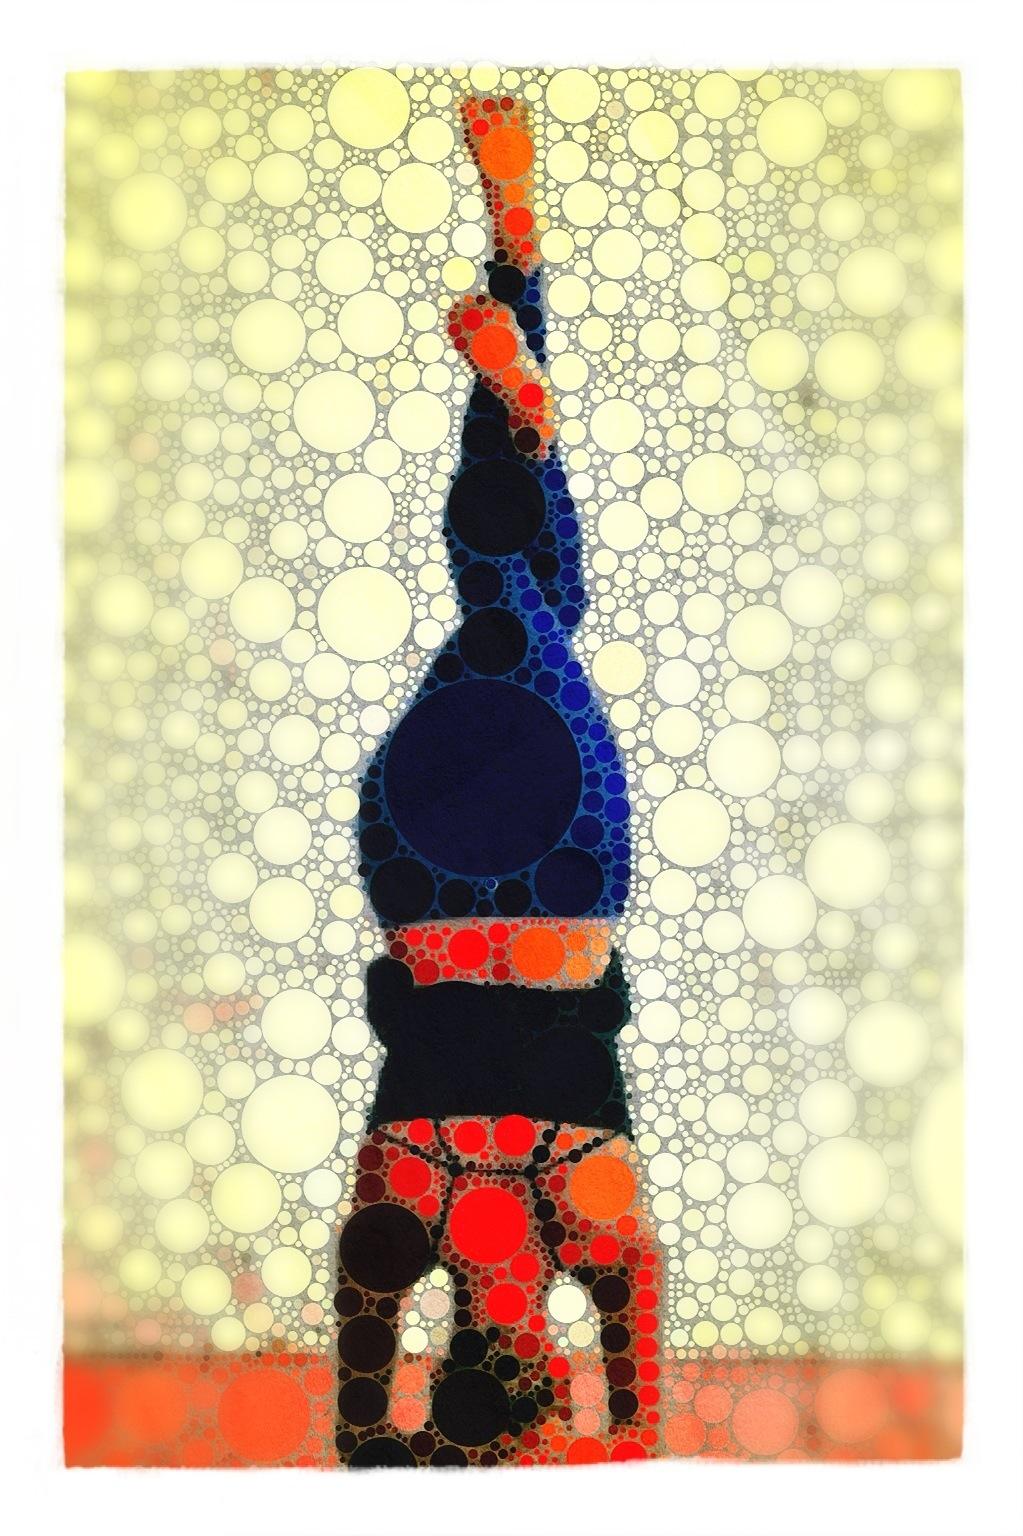 john dalton yoga art 1.jpg